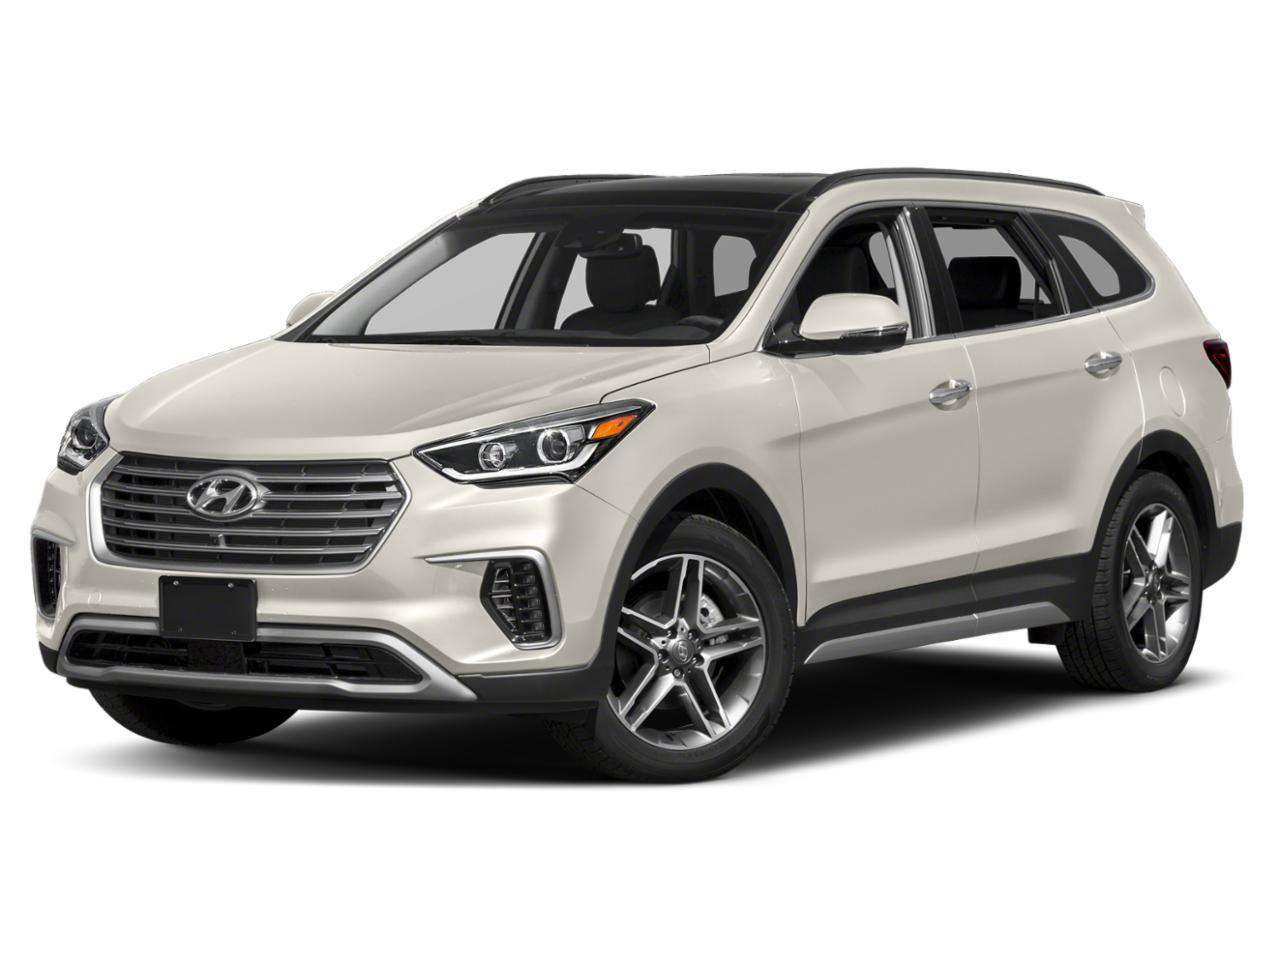 2019 Hyundai Santa Fe XL Vehicle Photo in Owensboro, KY 42303